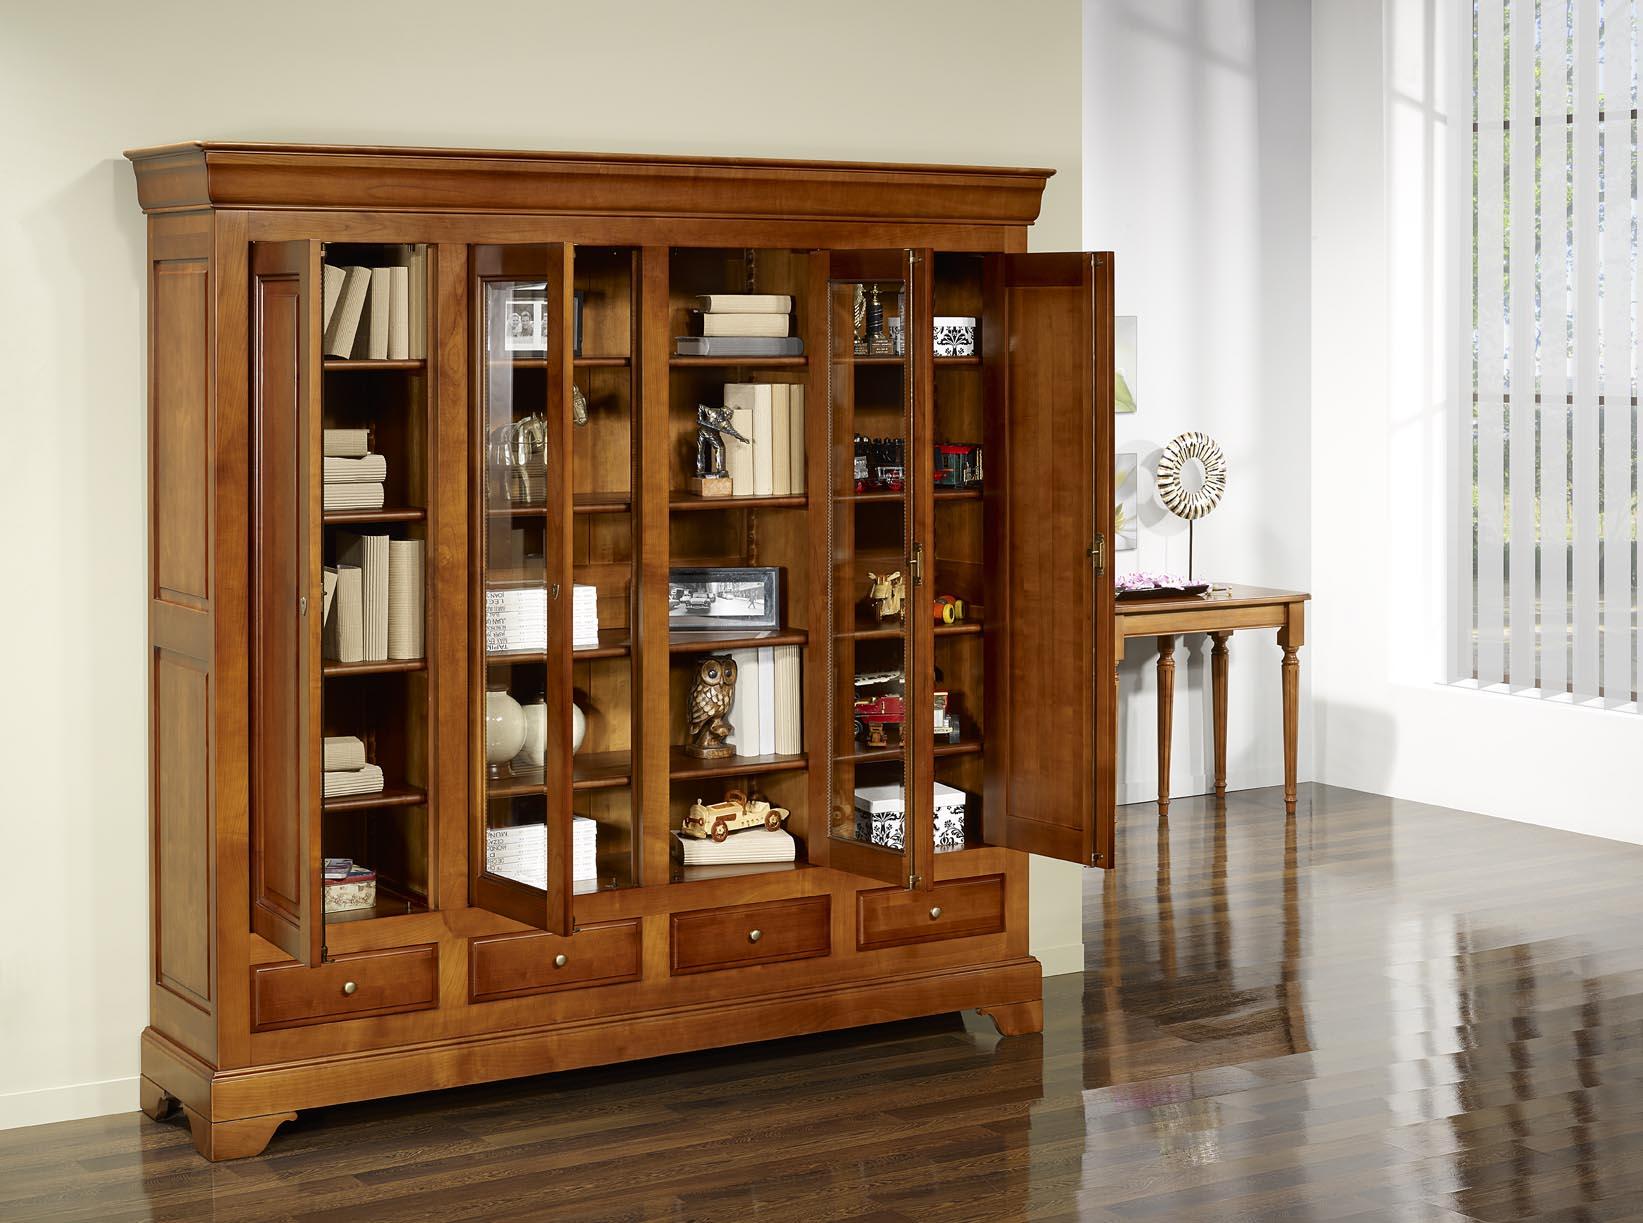 biblioth que 4 portes in s en merisier massif de style louis philippe meuble en merisier massif. Black Bedroom Furniture Sets. Home Design Ideas